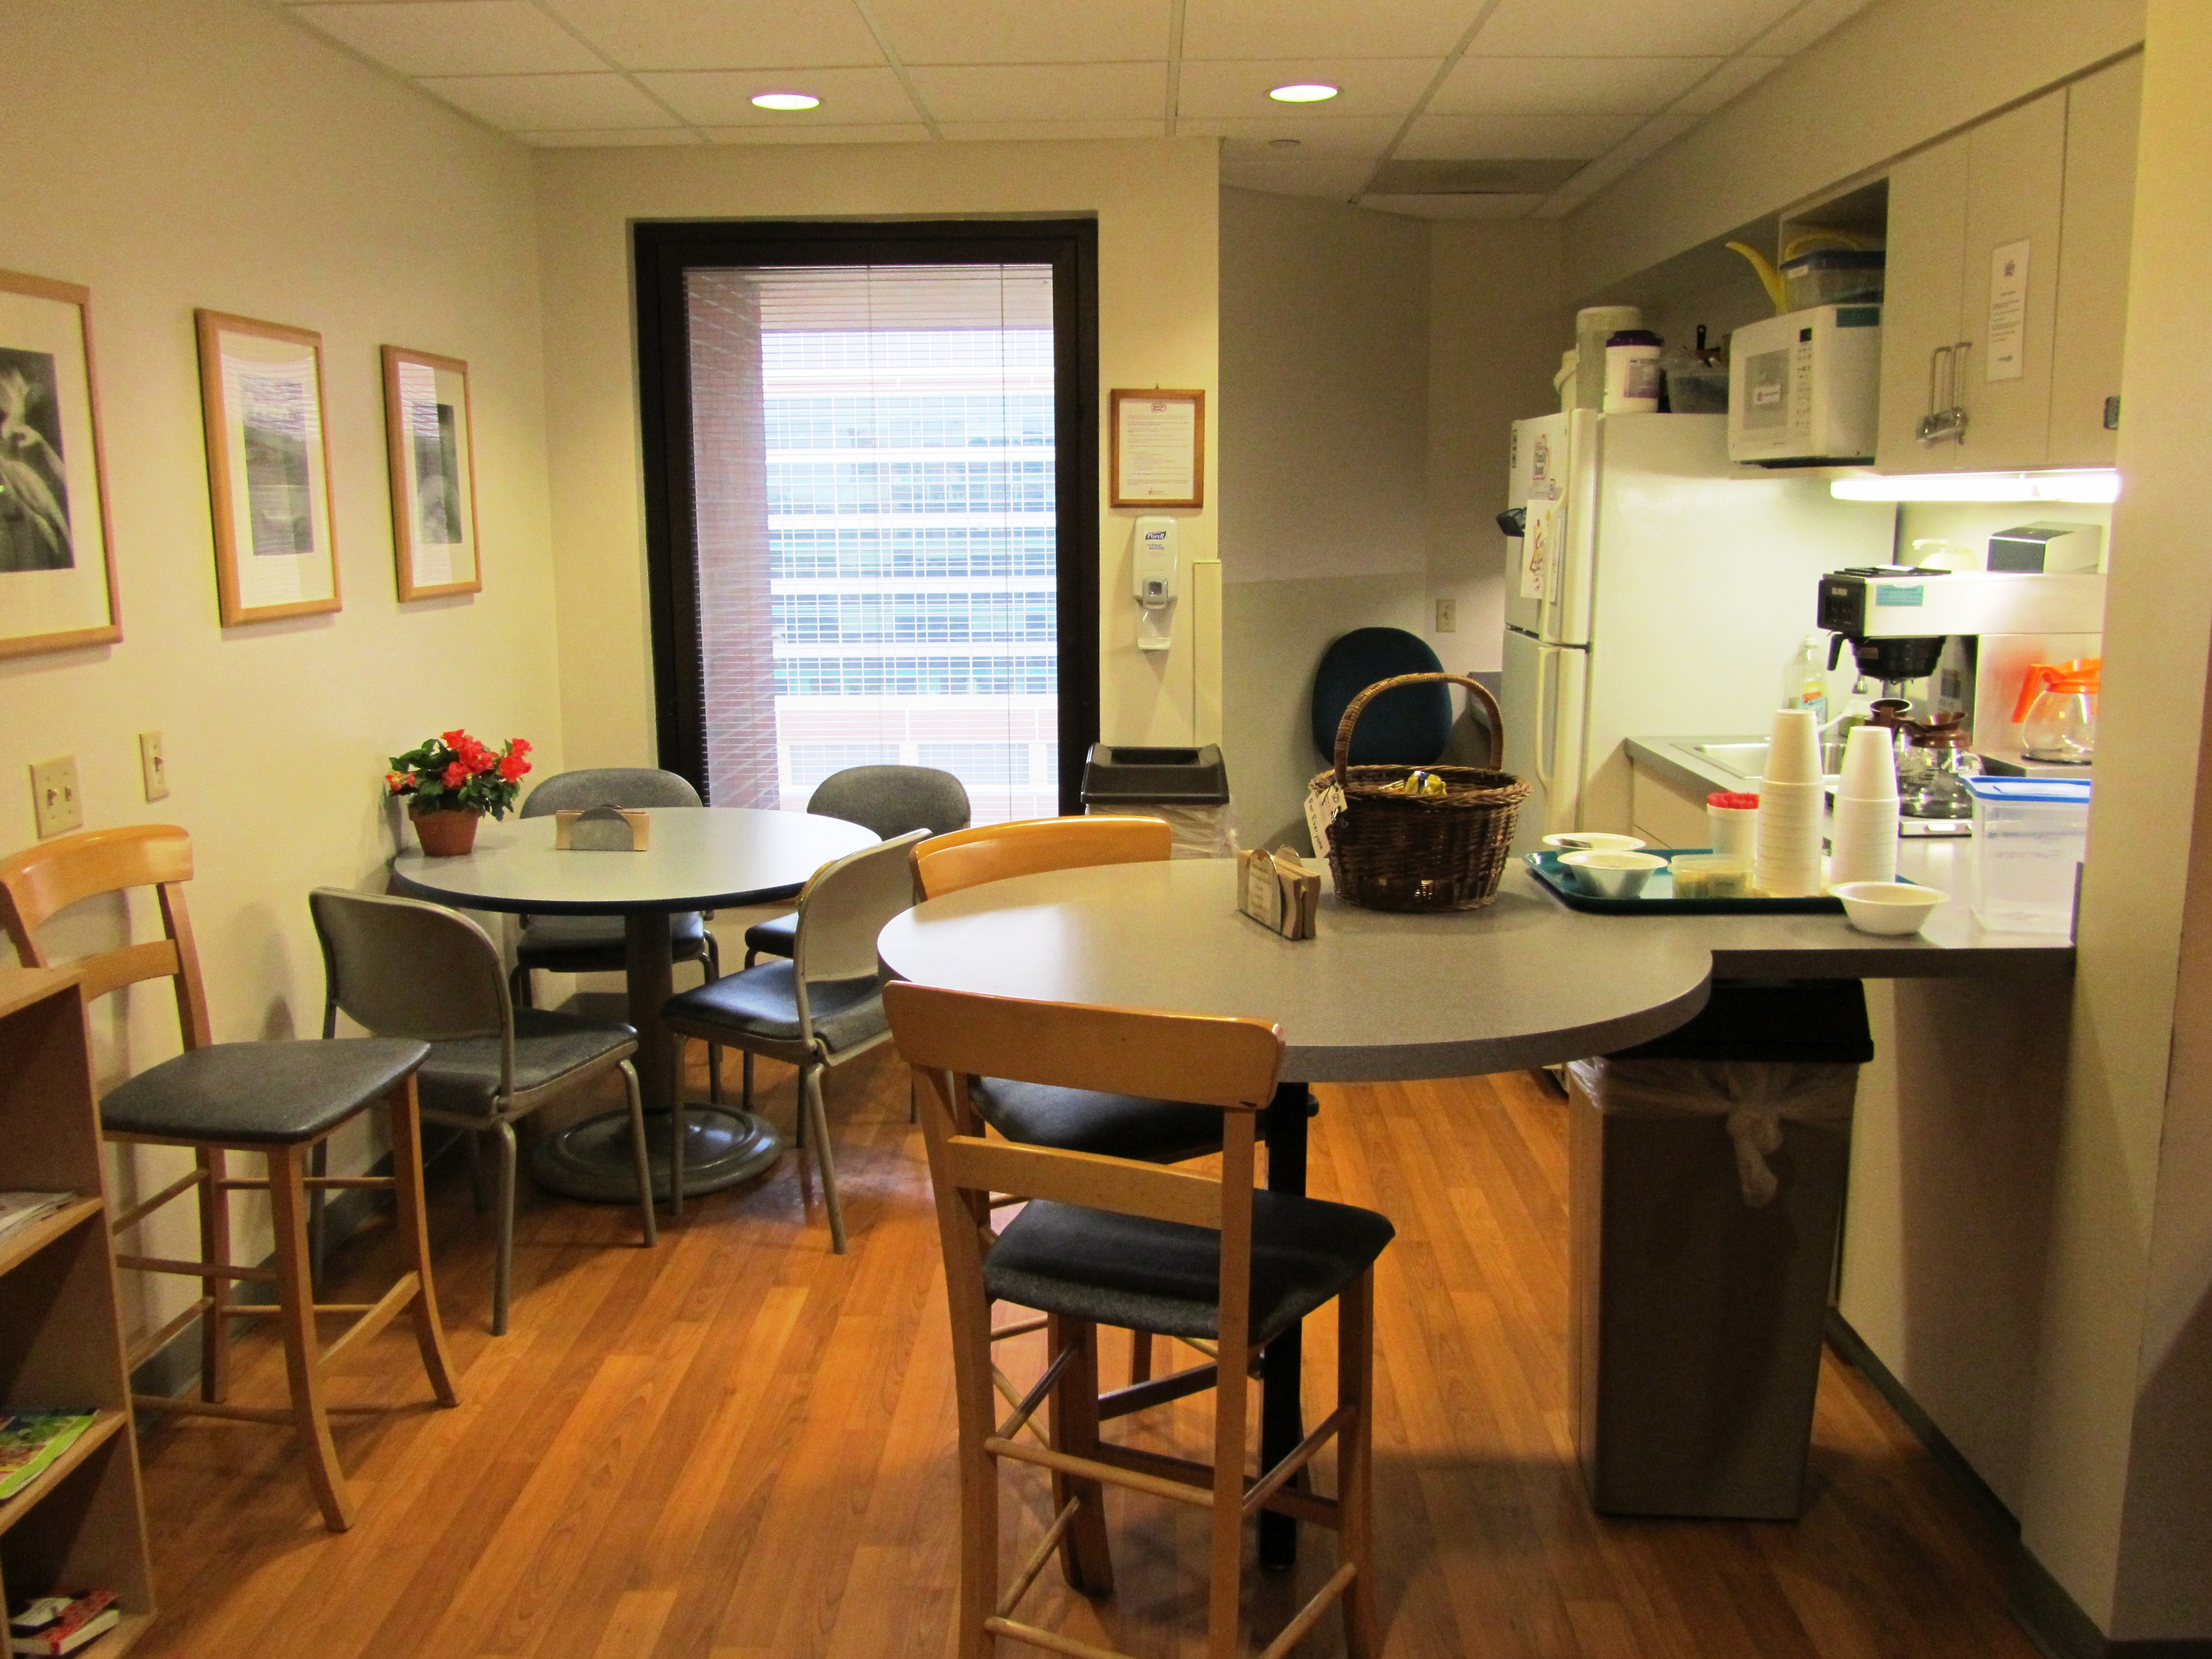 Family room at uf health shands hospital for Ronald mcdonald family room